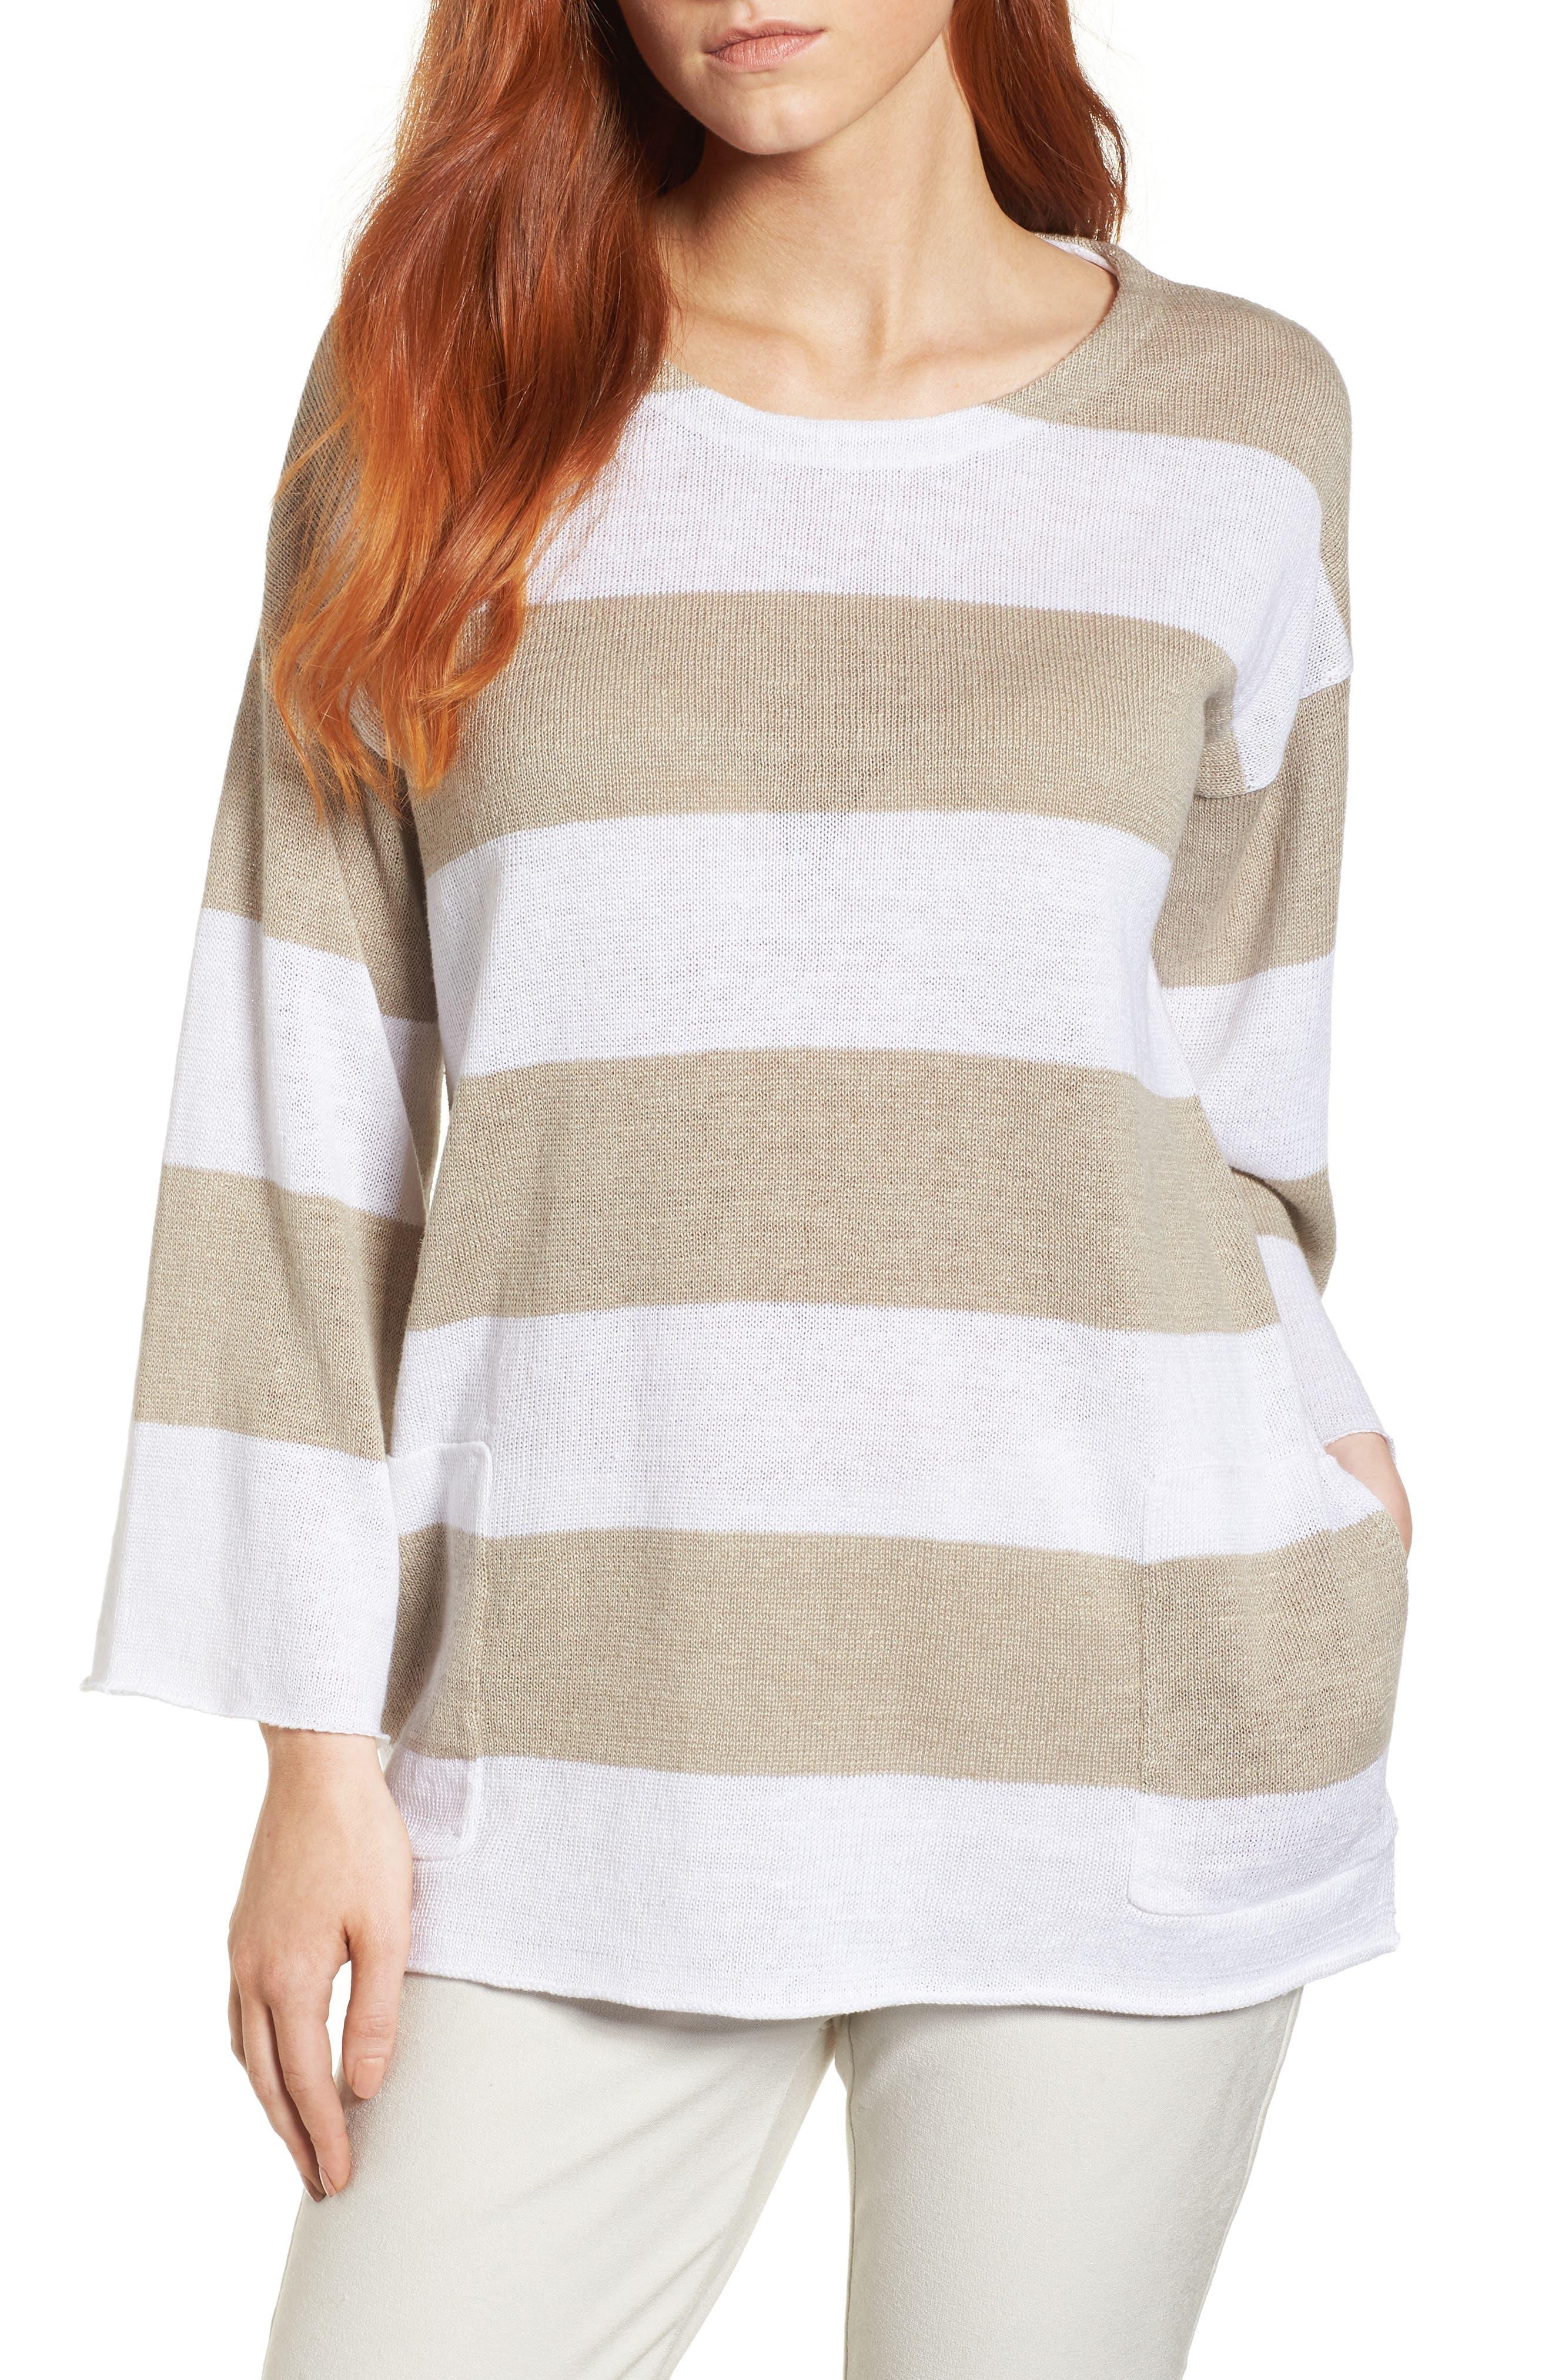 Stripe Organic Linen Knit A-Line Top,                         Main,                         color, White/ Natural